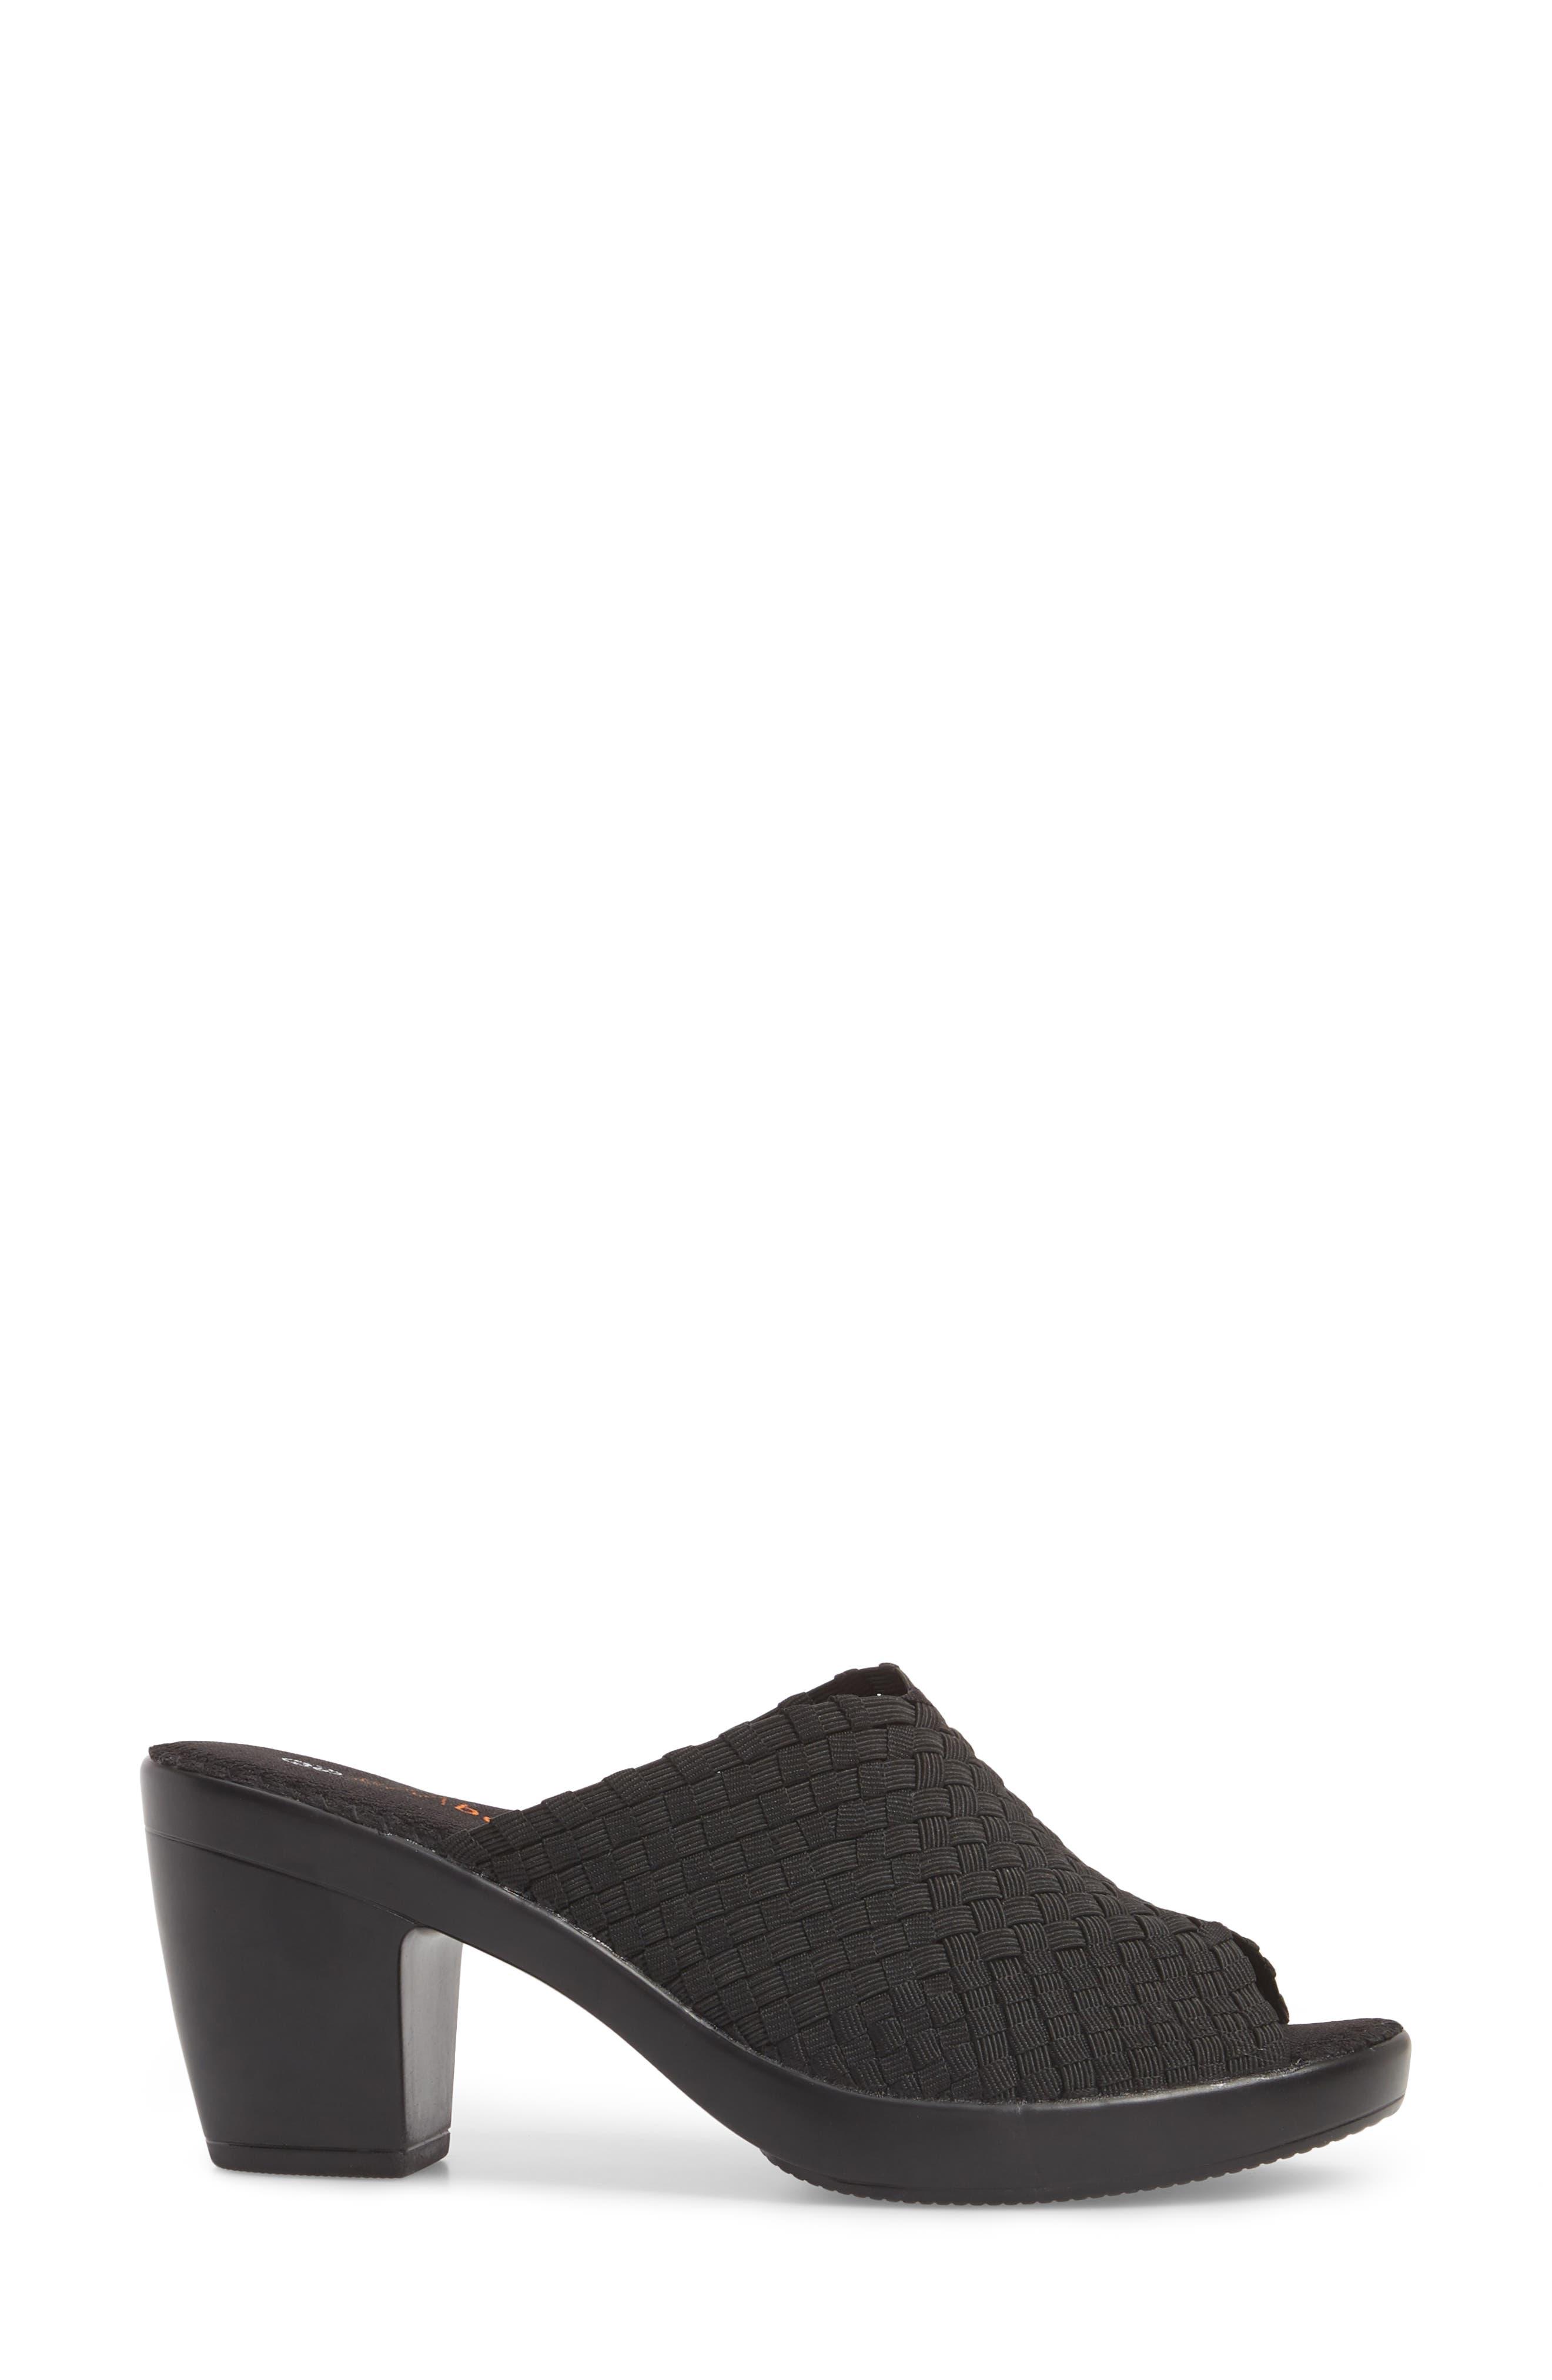 BERNIE MEV., Sun Texas Sandal, Alternate thumbnail 3, color, BLACK FABRIC